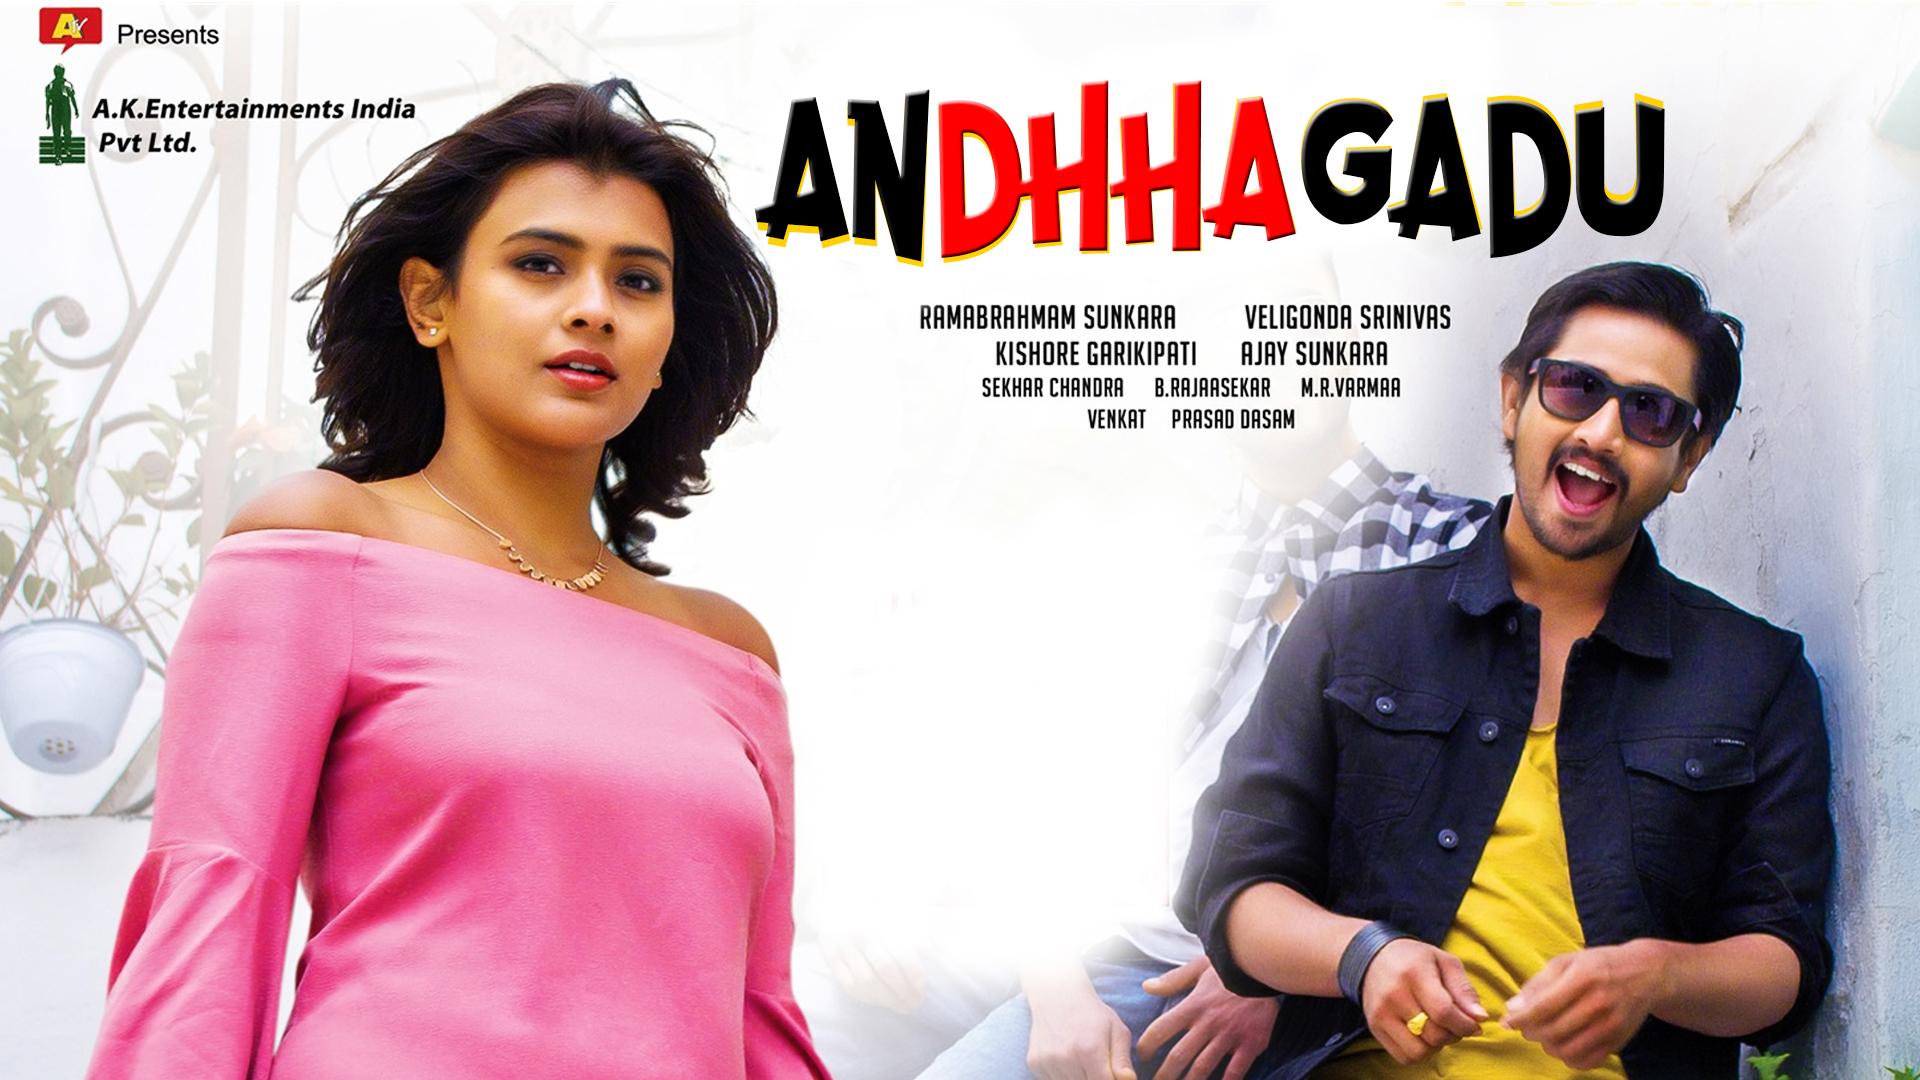 Andhhagadu